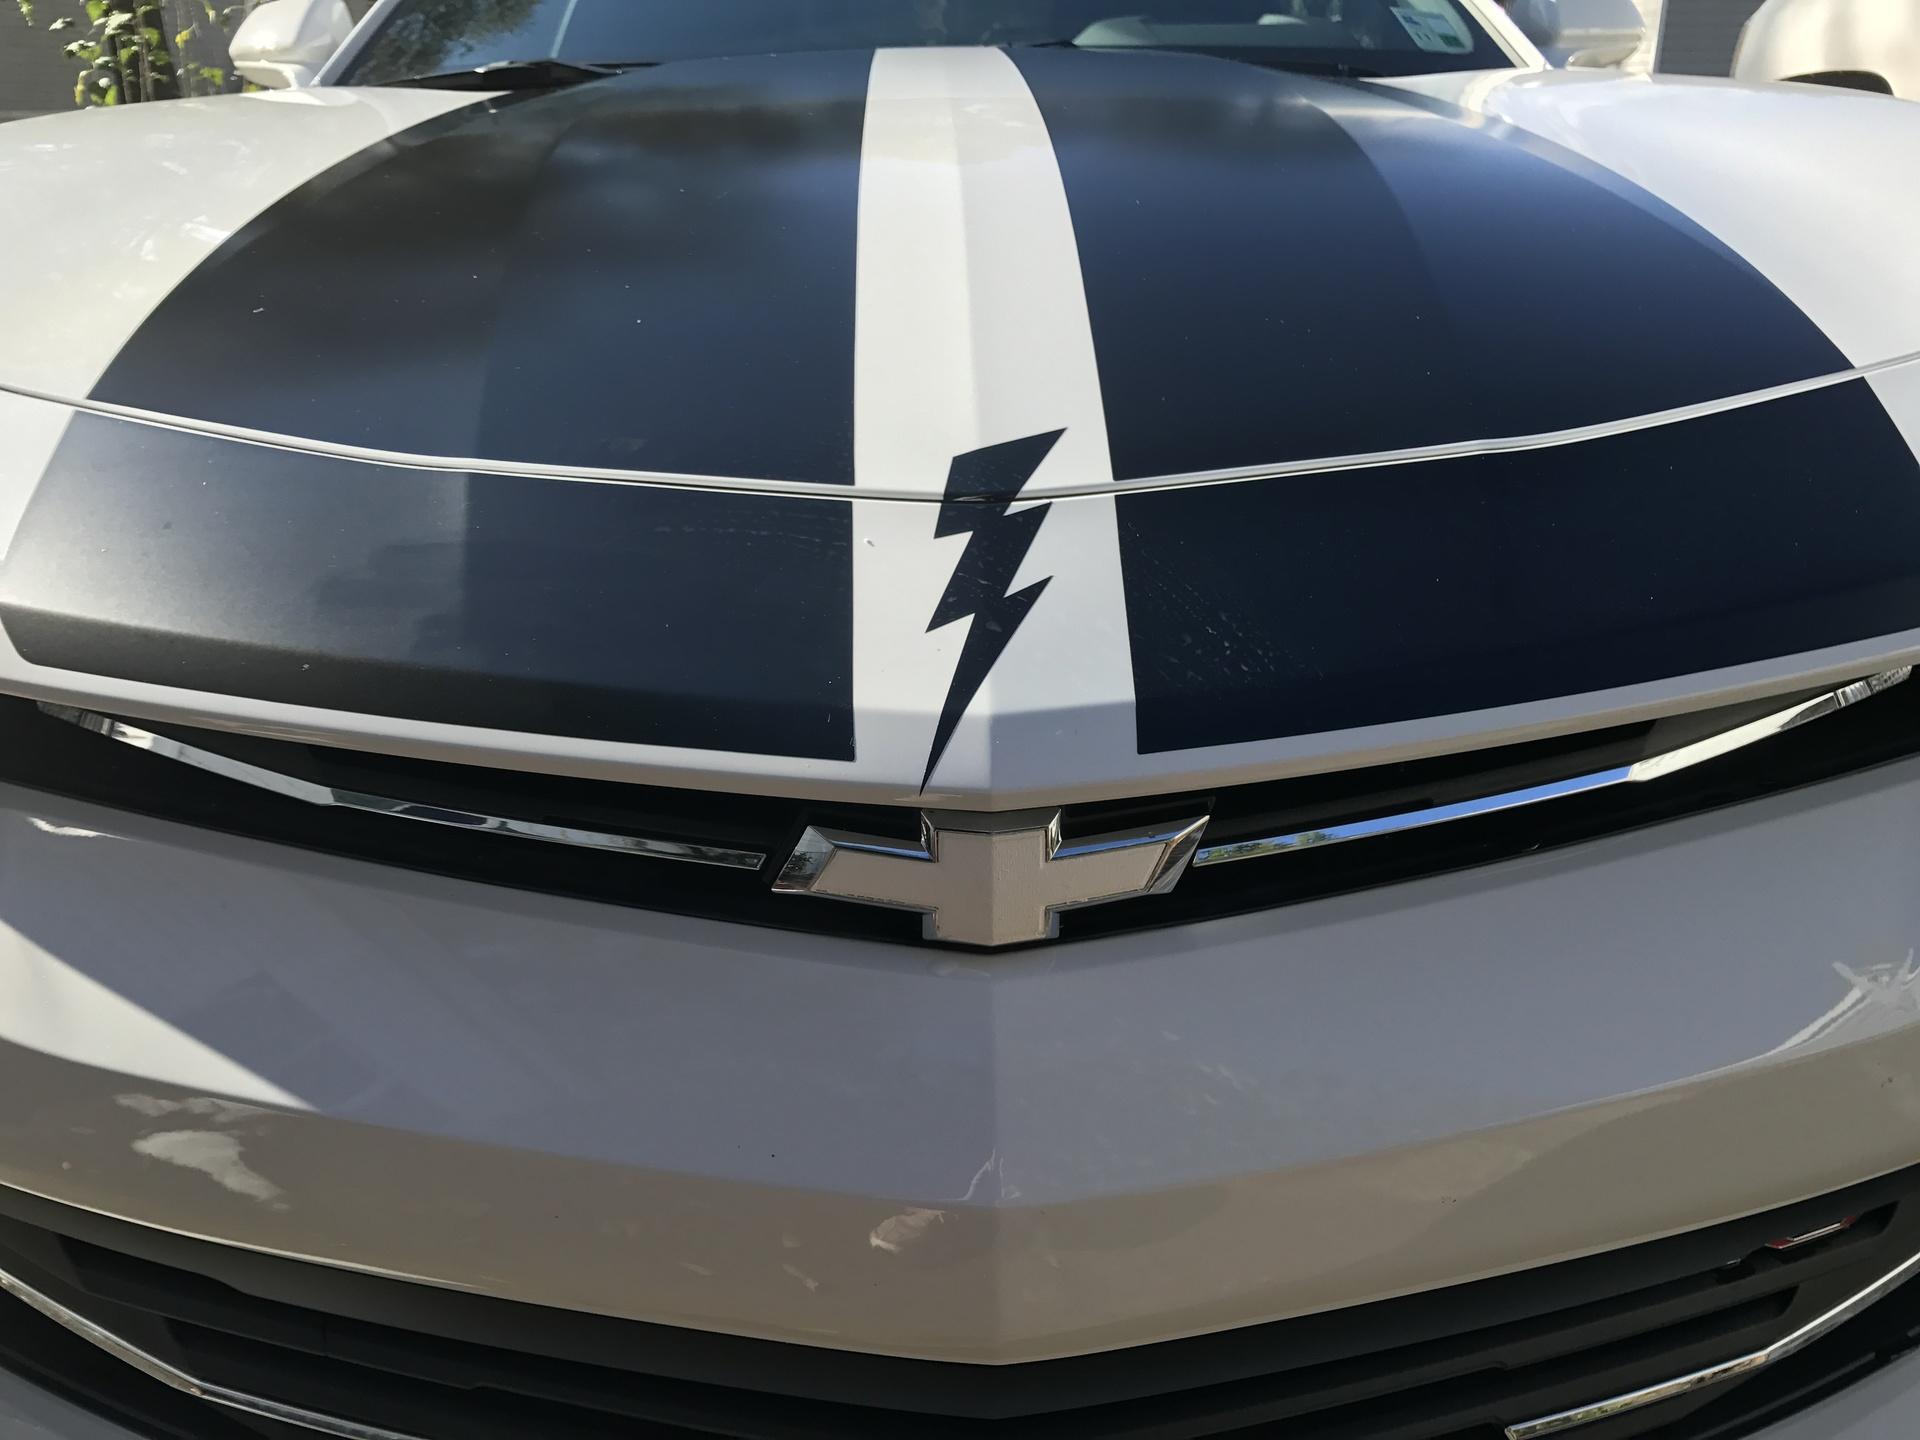 Randy's photograph of their Classic Lightning Bolt Sticker